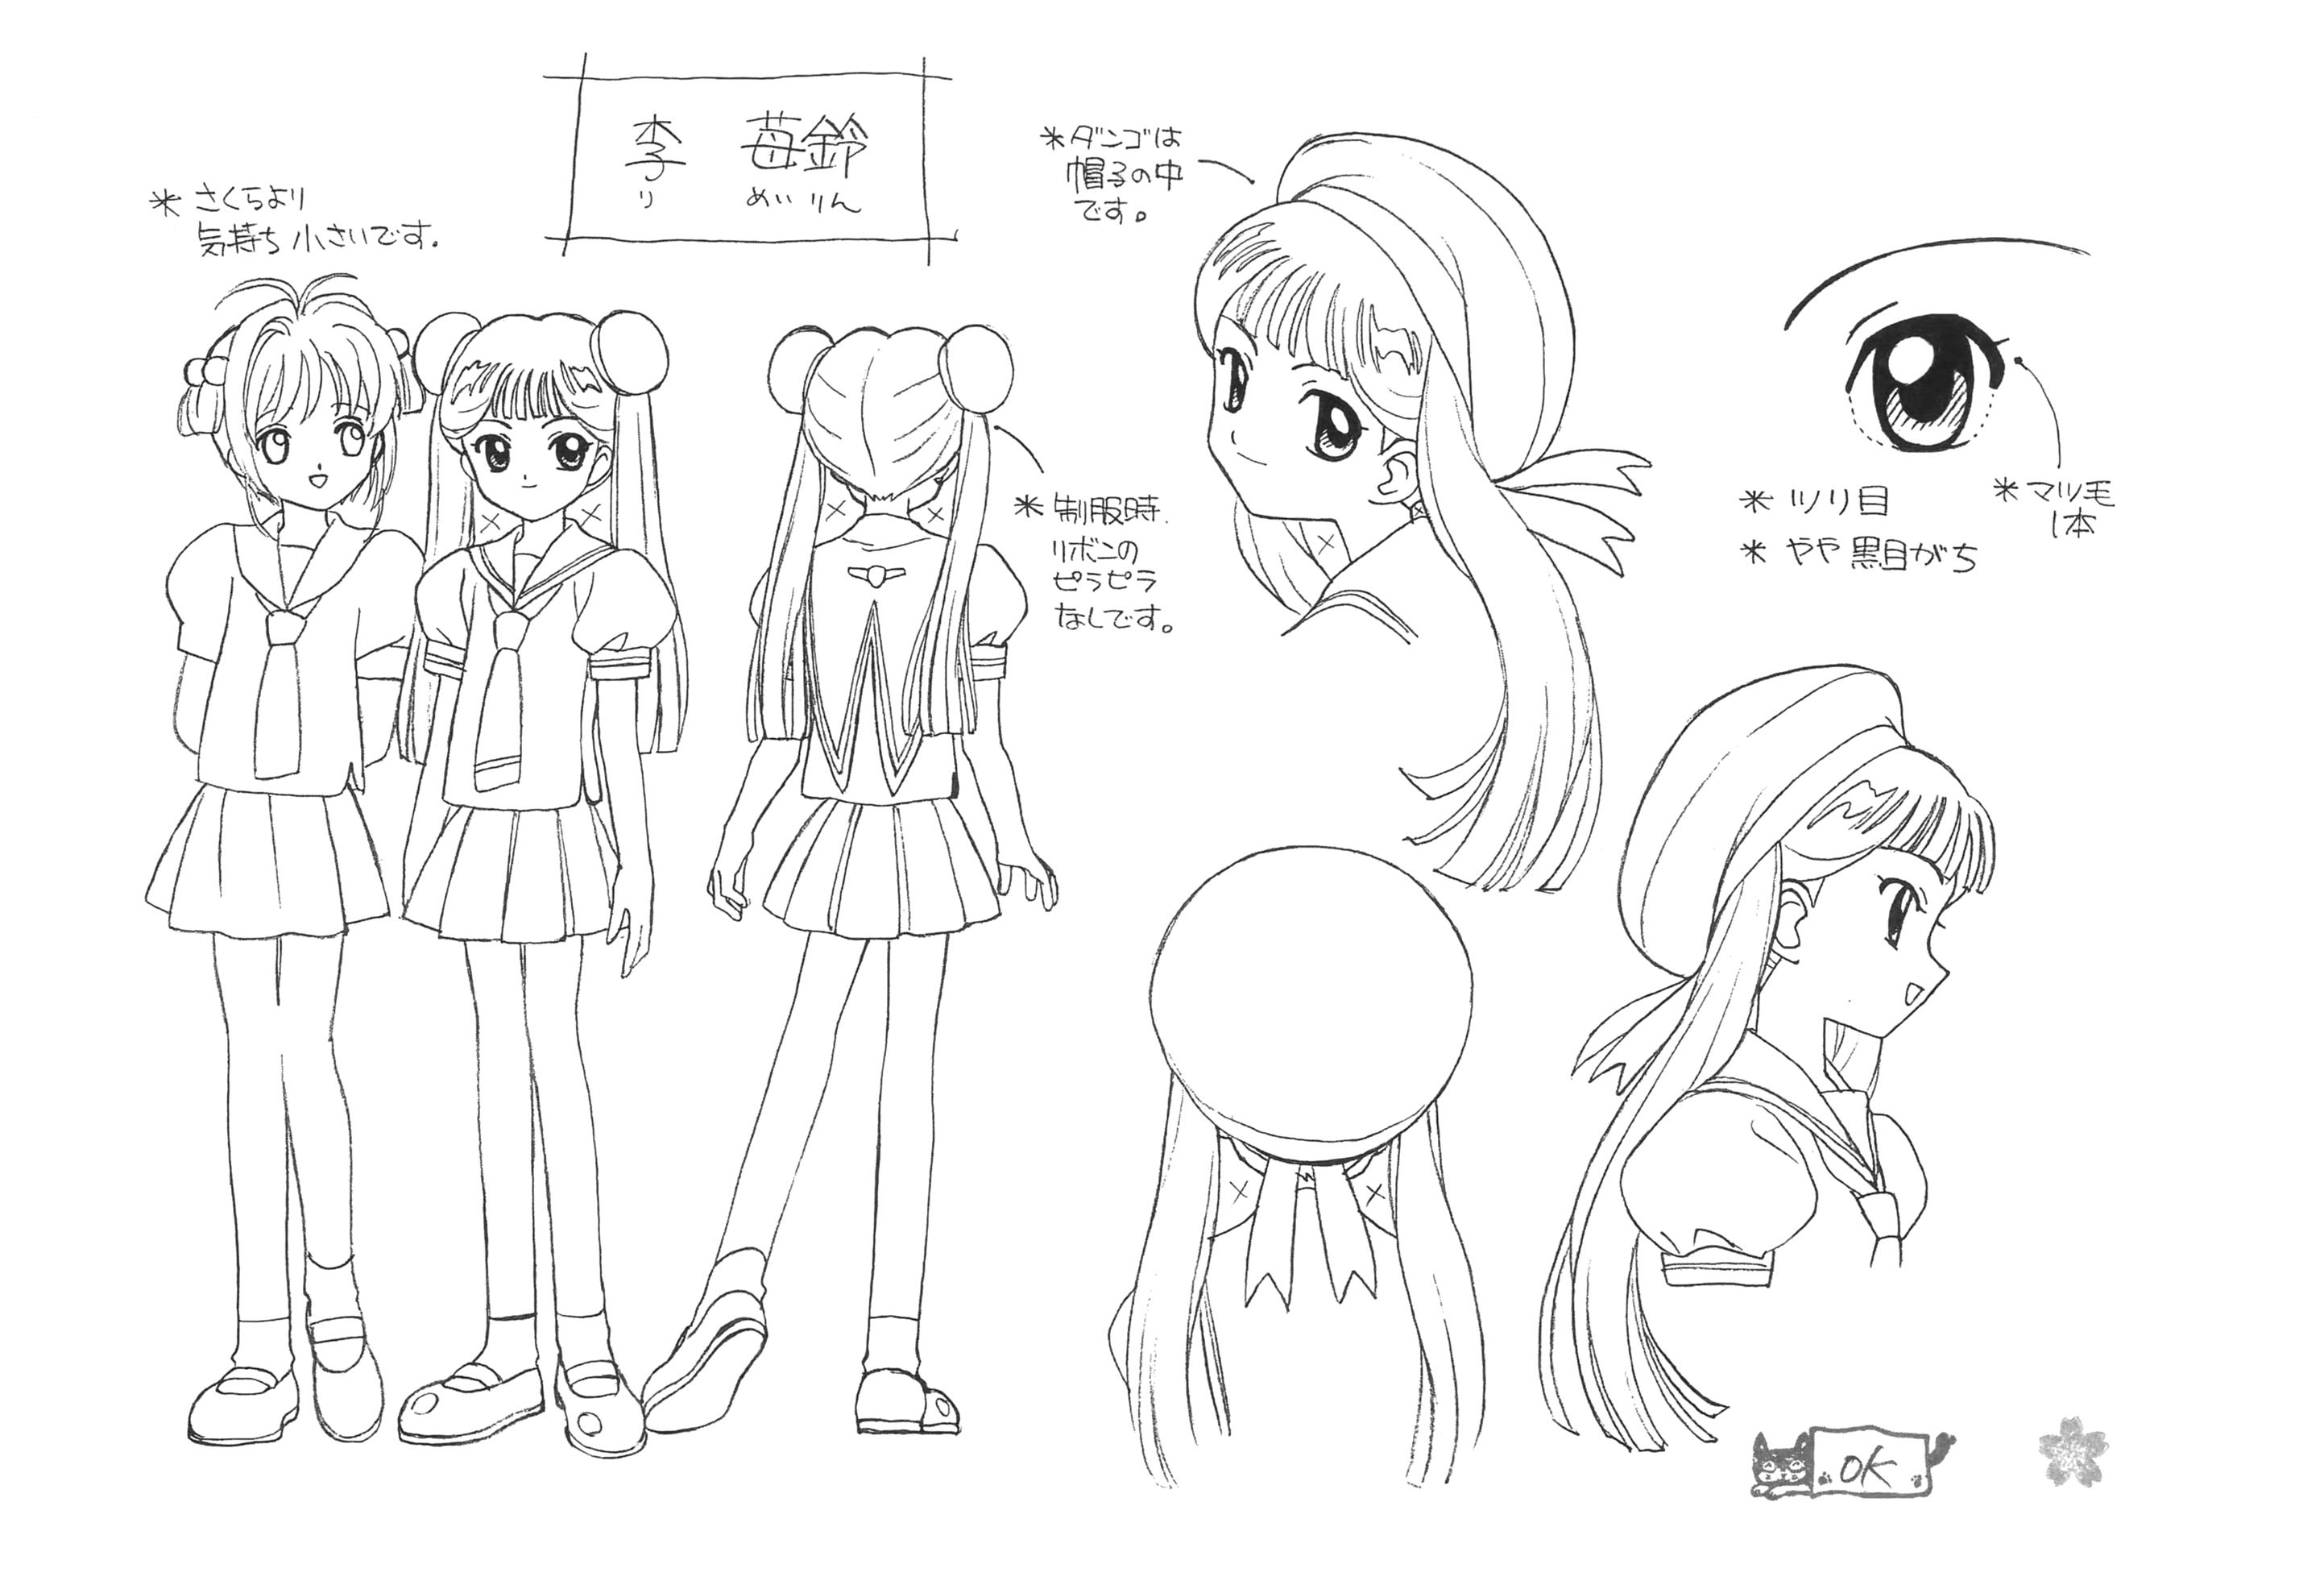 Cardcaptor Sakura Animated Works Special Edition Cardcaptor Sakura Cardcaptor Anime Lineart